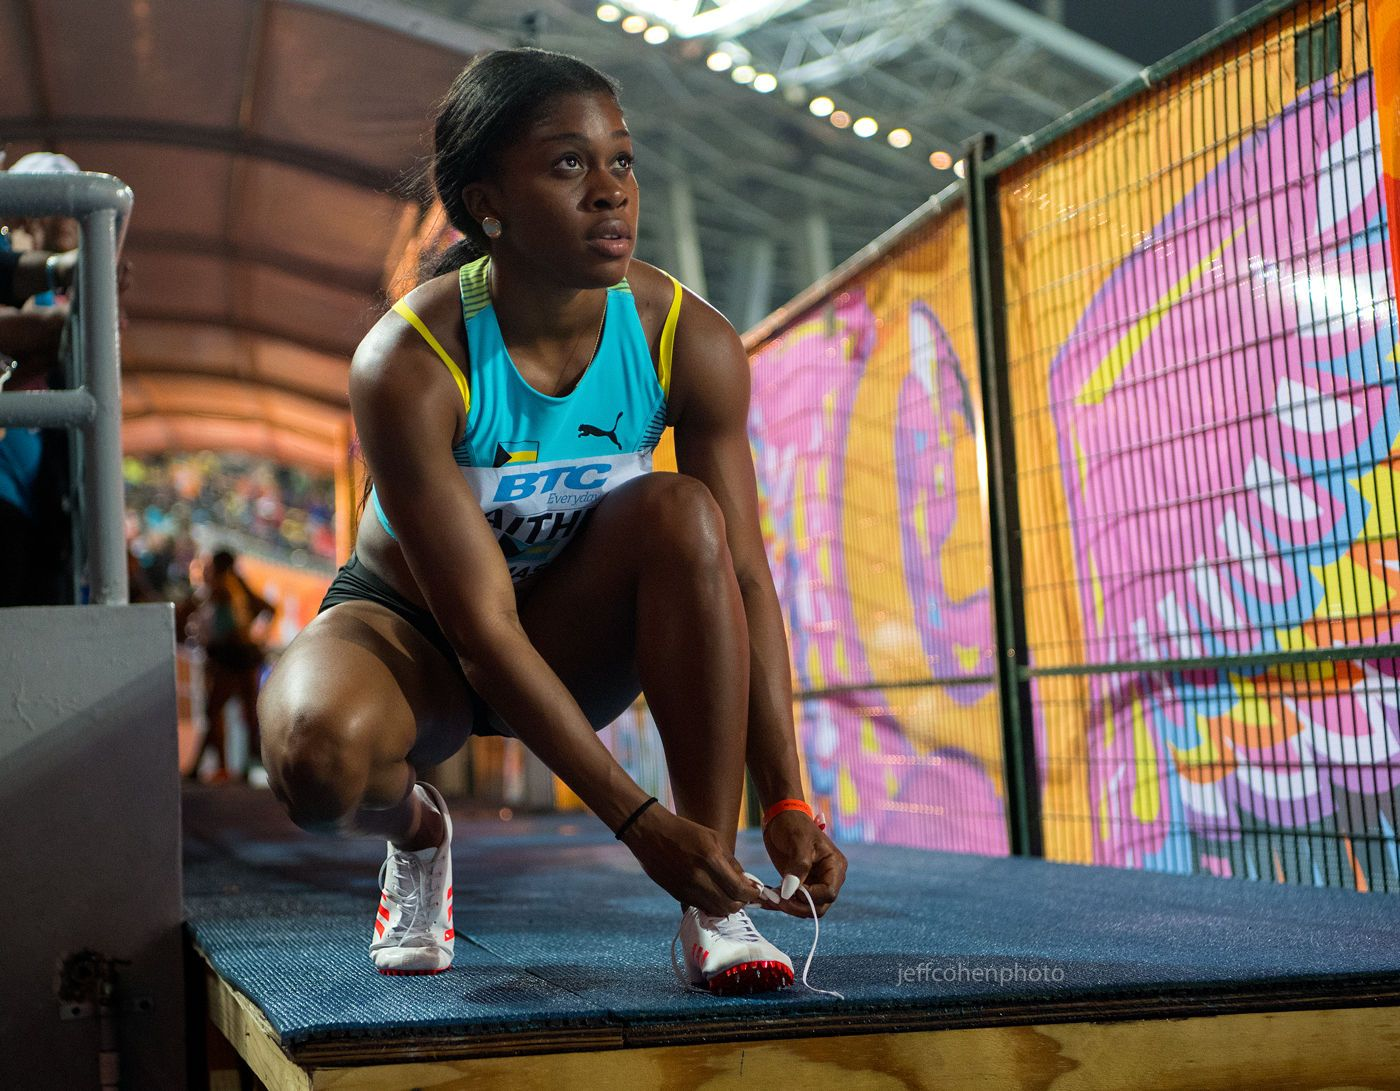 1r2017_bahamas_relays_day_2_gaither_tynia_bahamas_4x100____jeff_cohen_photo__204_web.jpg